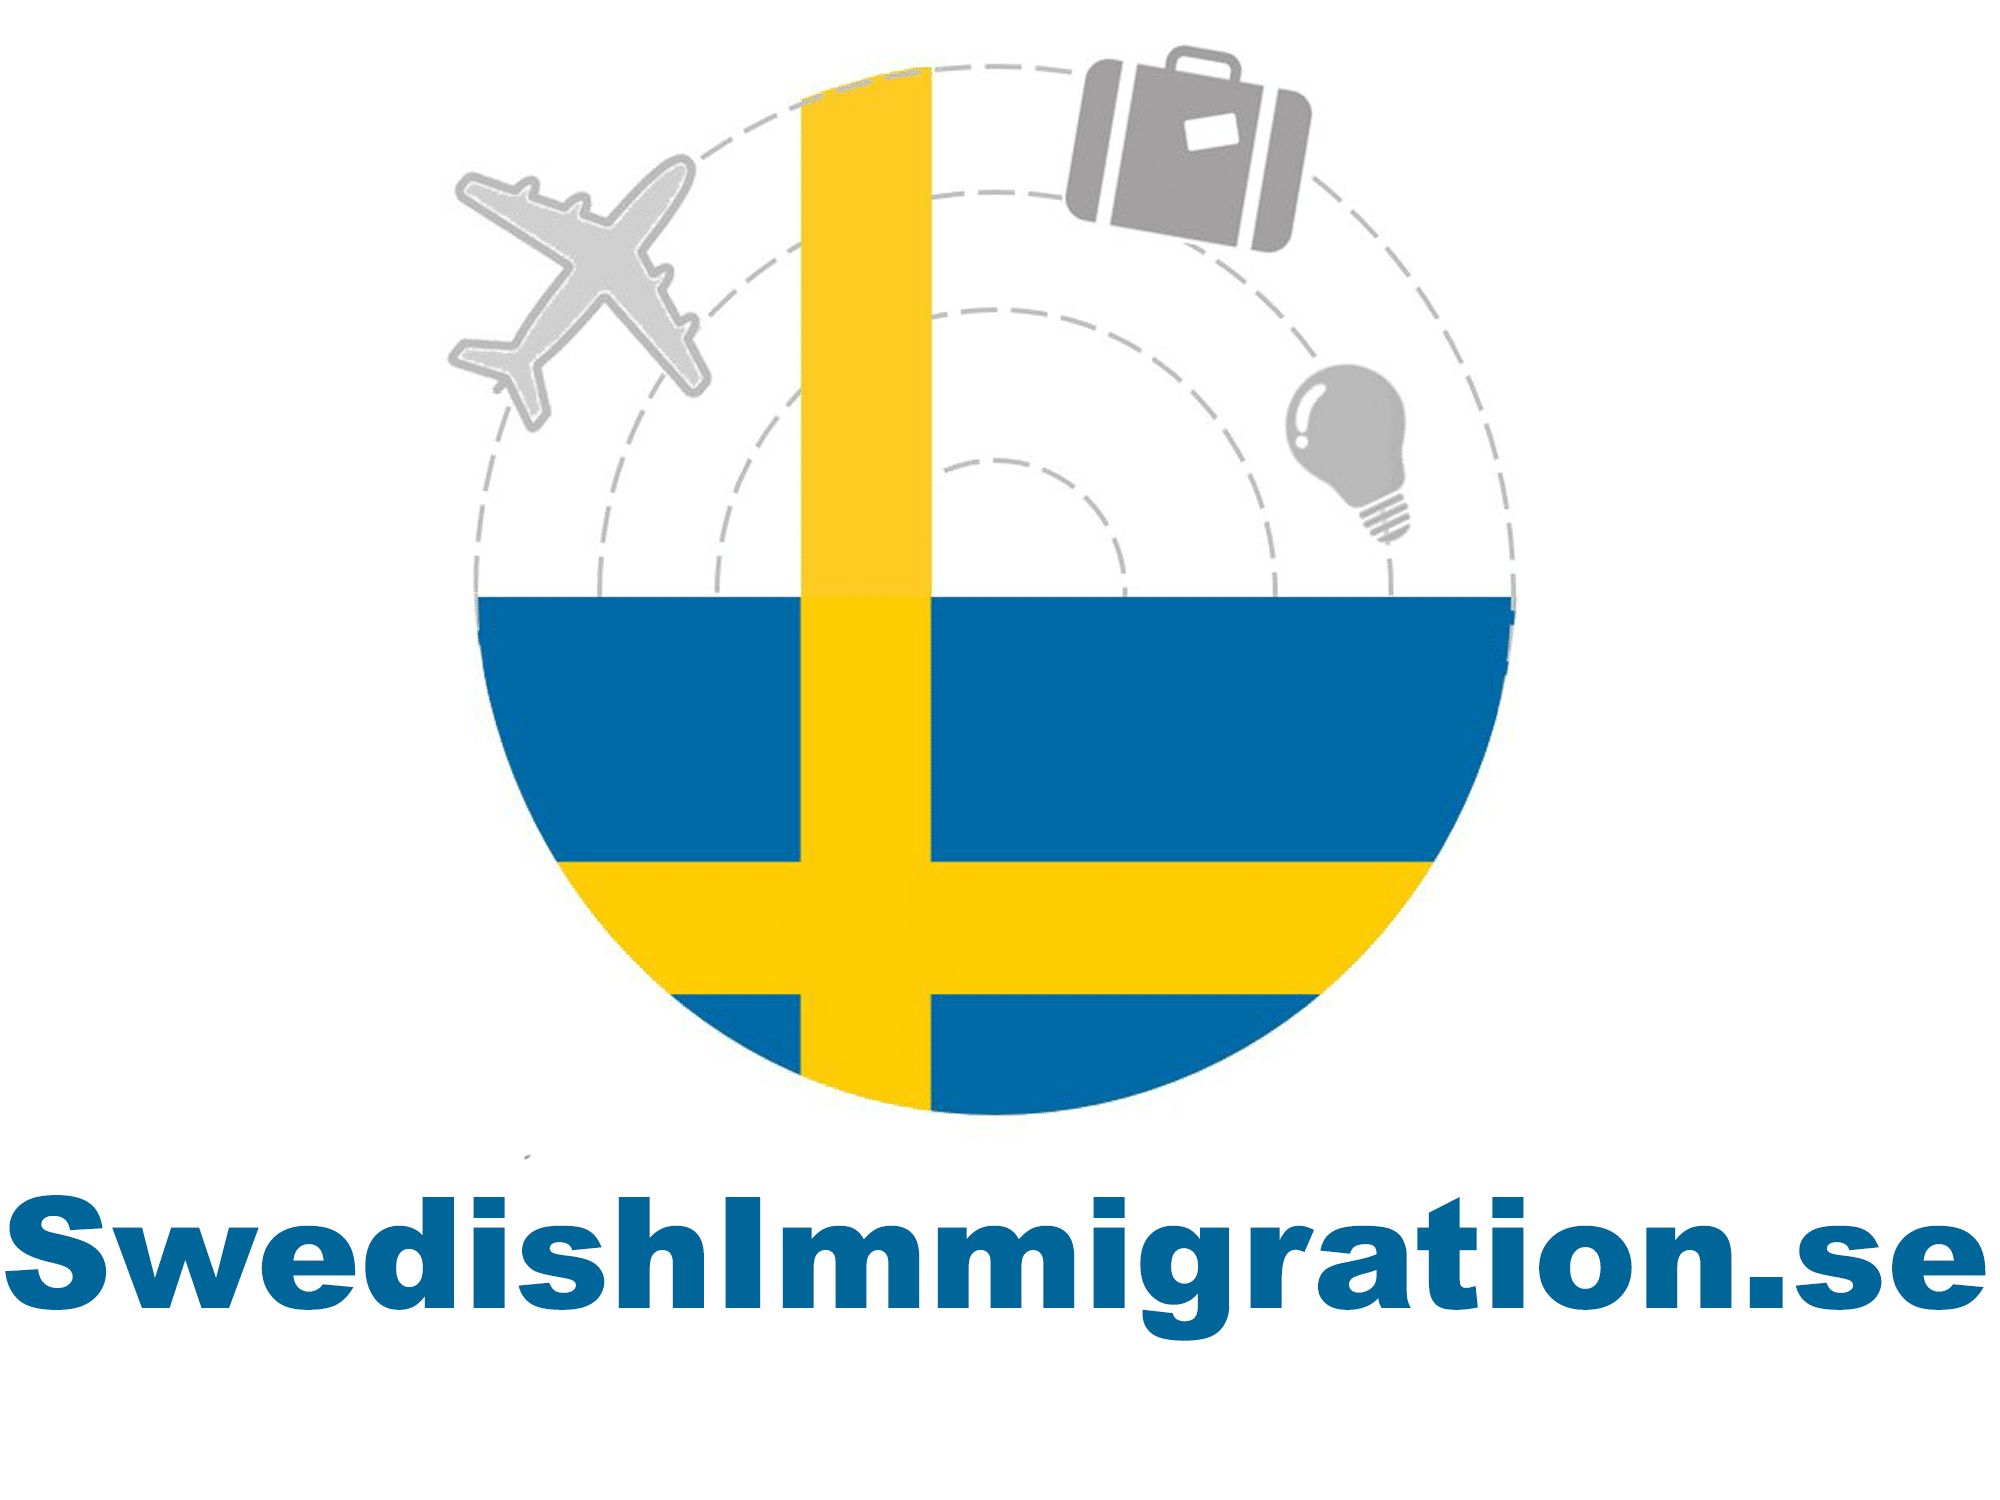 Swedish Immigration